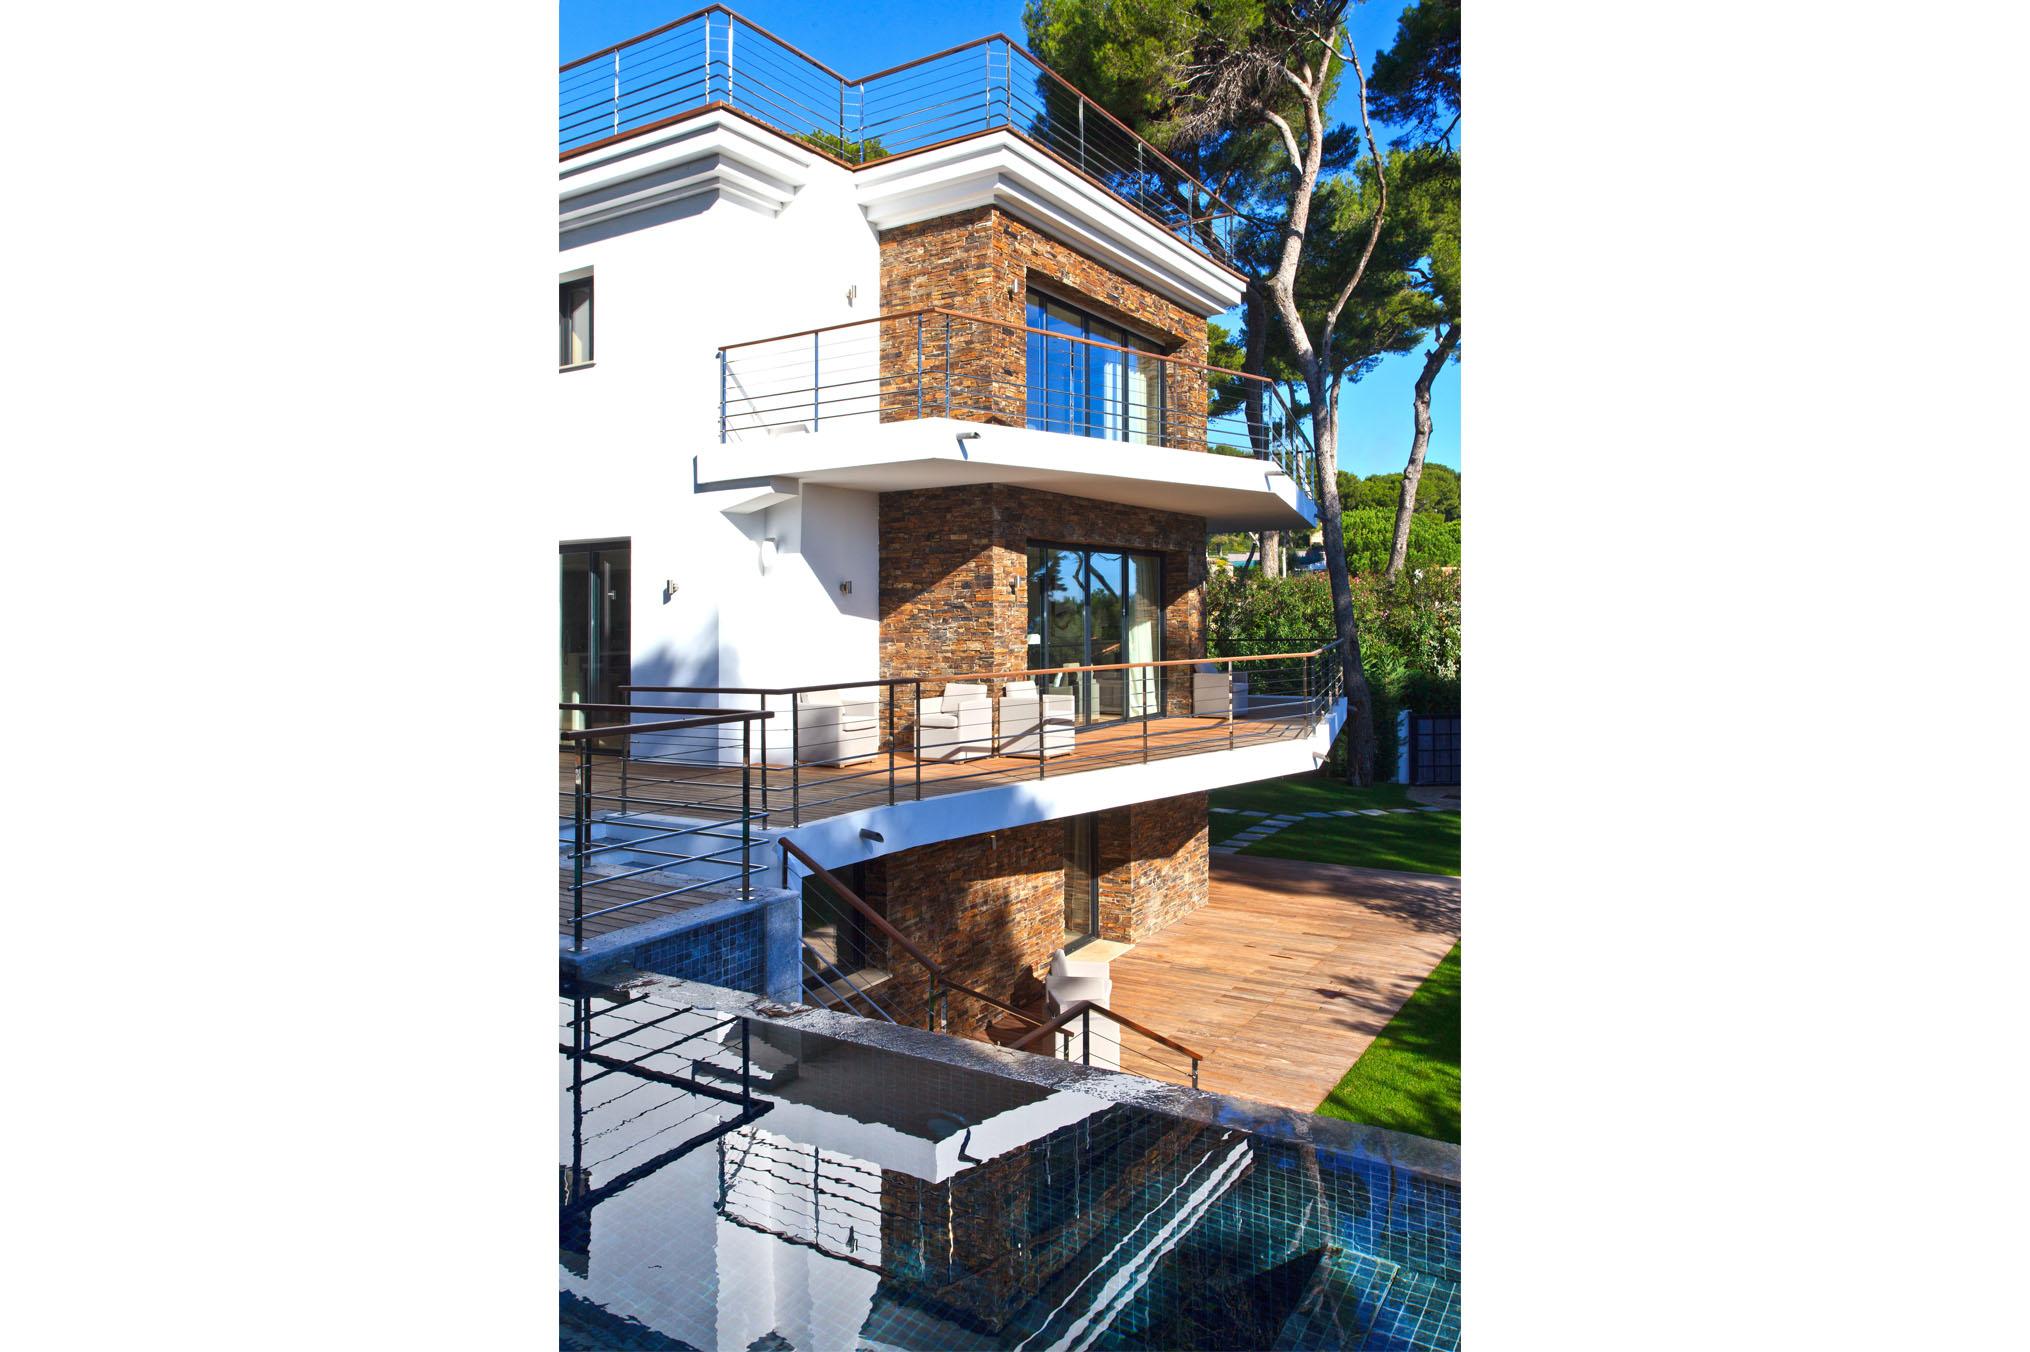 Les p cheurs for R house design